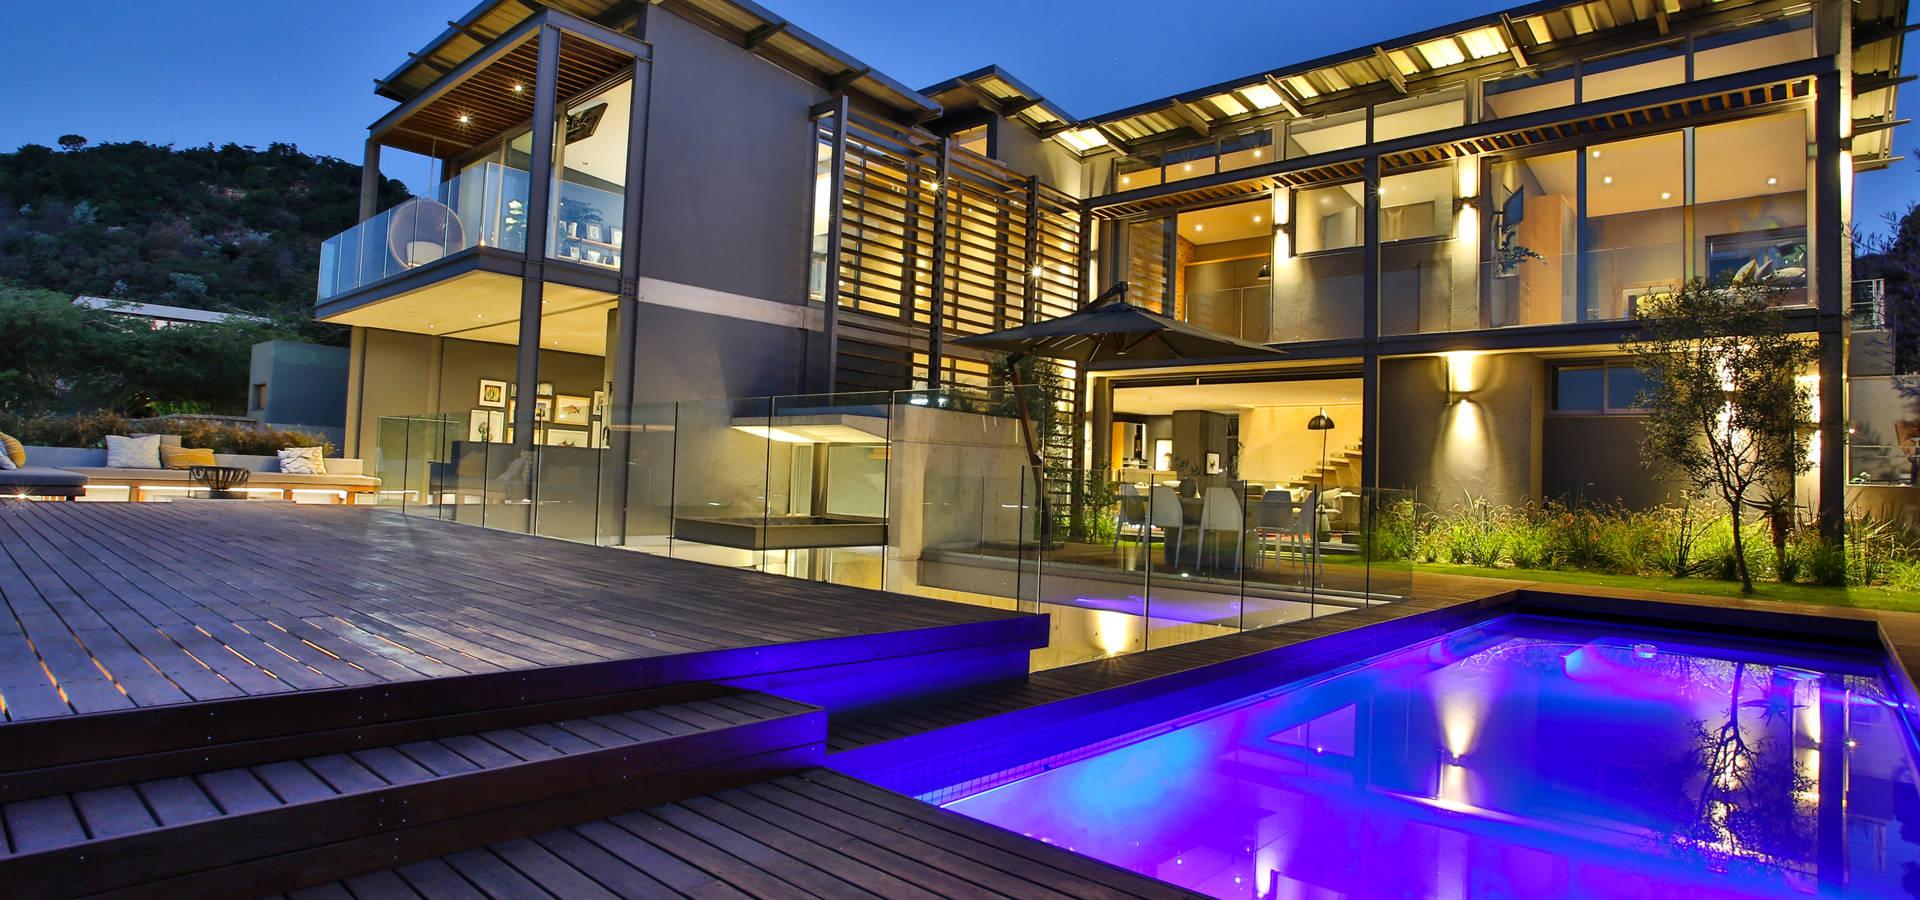 Blunt Architects